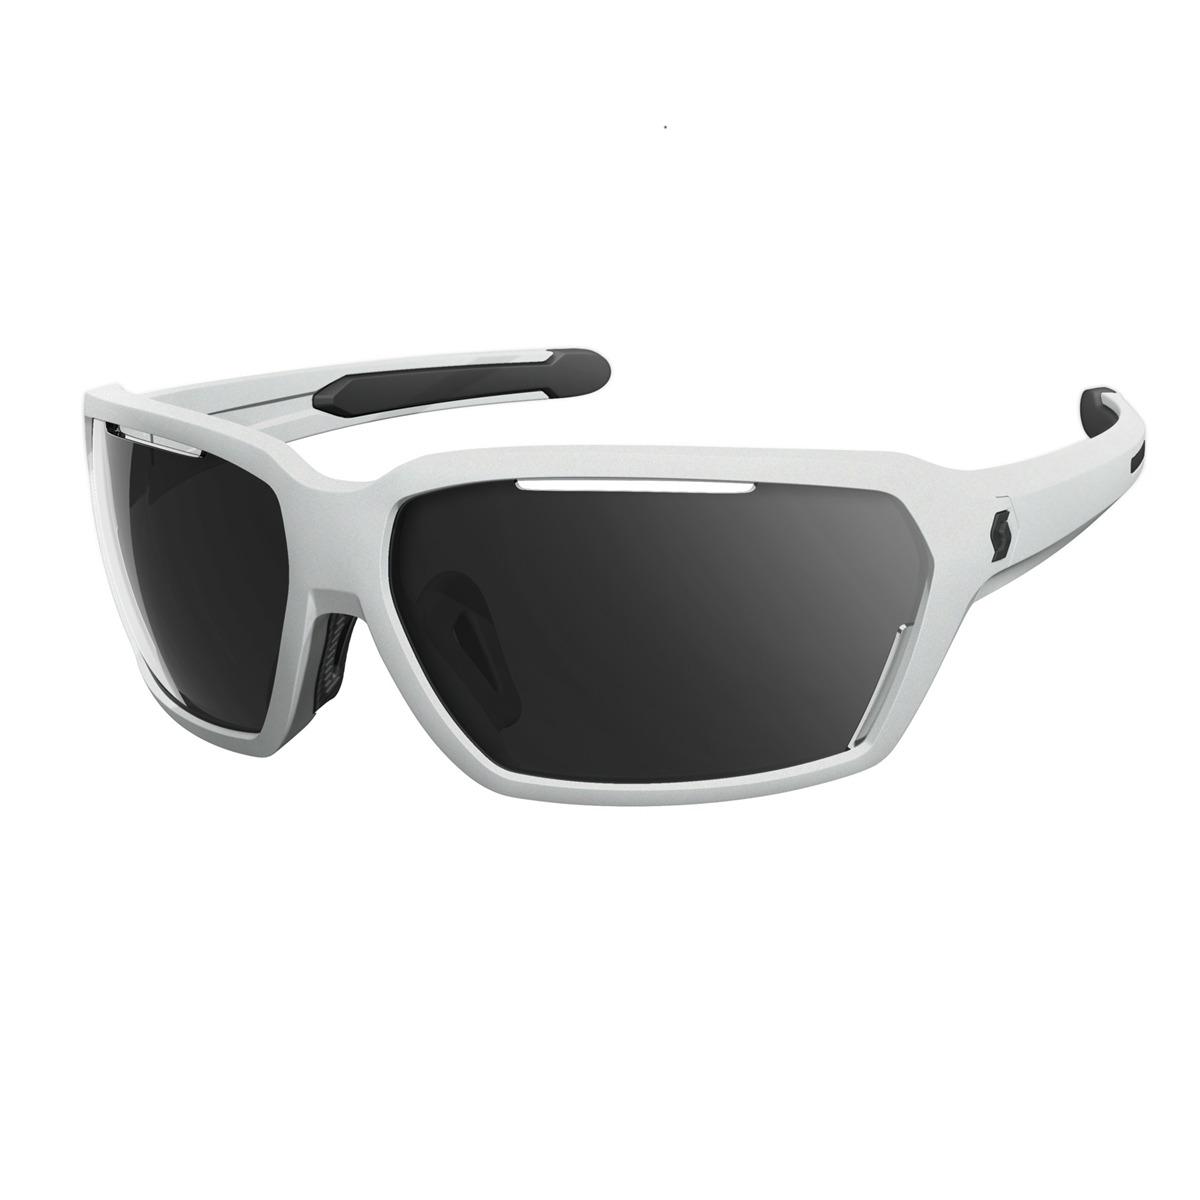 7dcc2f6fe581d oculos scott vector branco fosco. Carregando zoom.